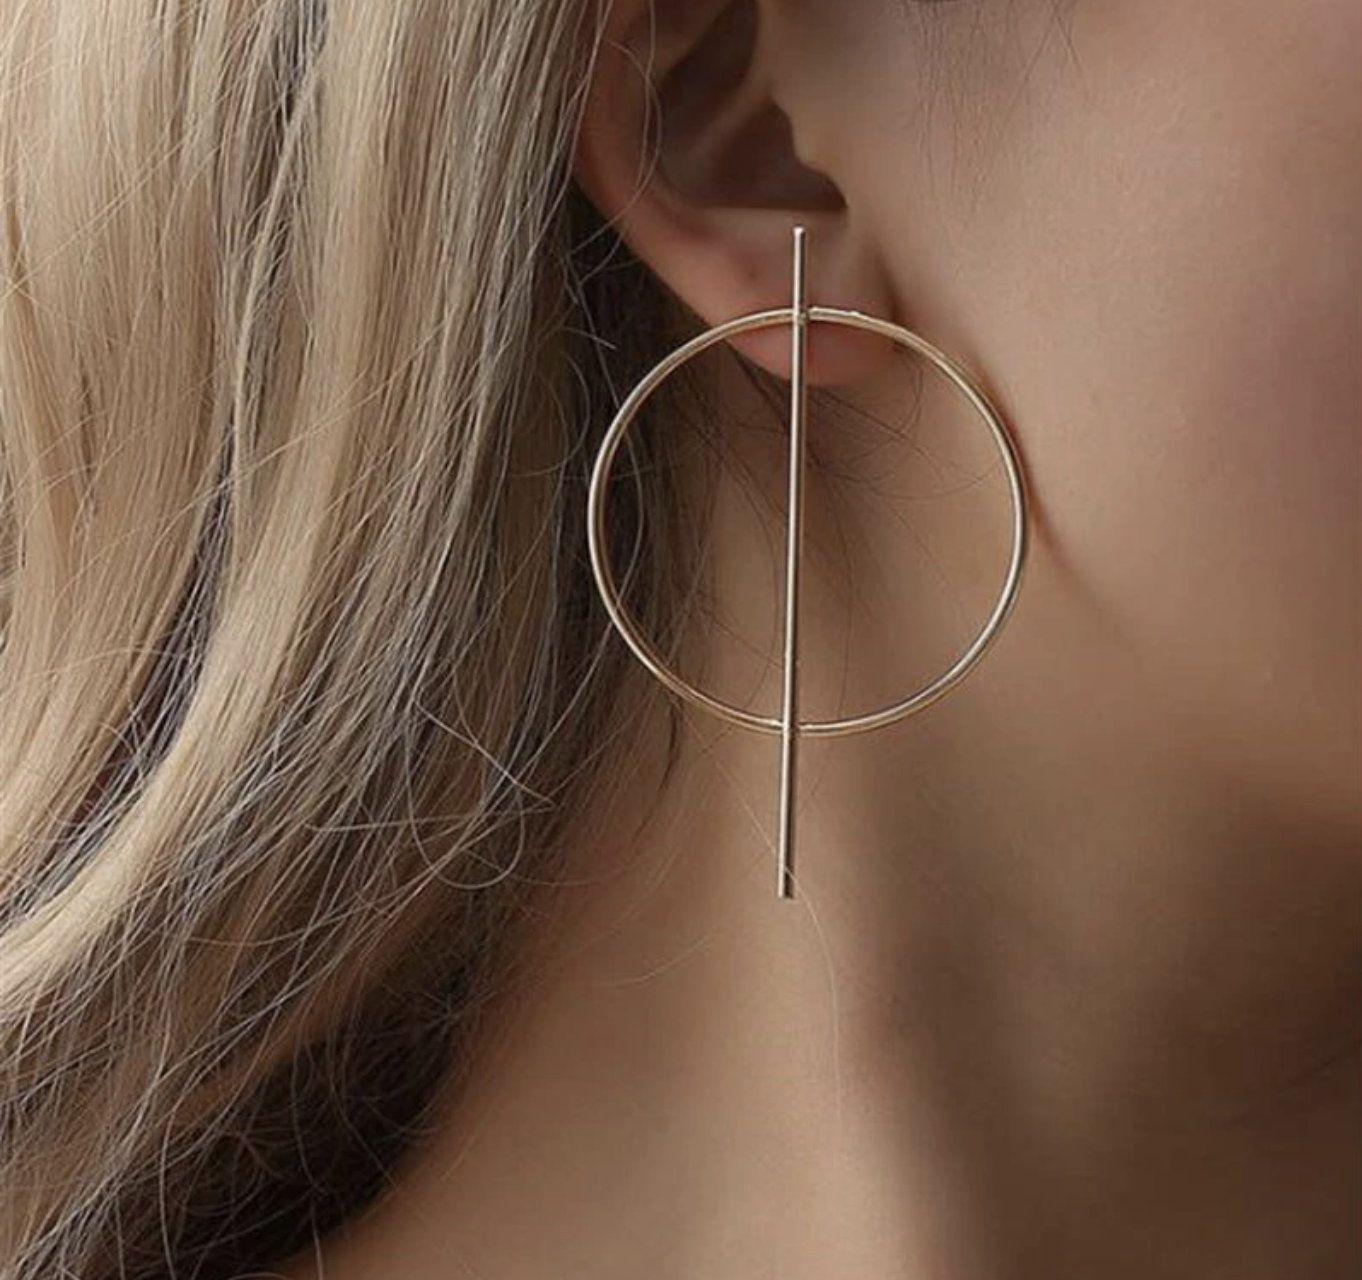 caa2b861586e39 Minimal Big Drop Earrings for Women Gold Silver Circle Round ...